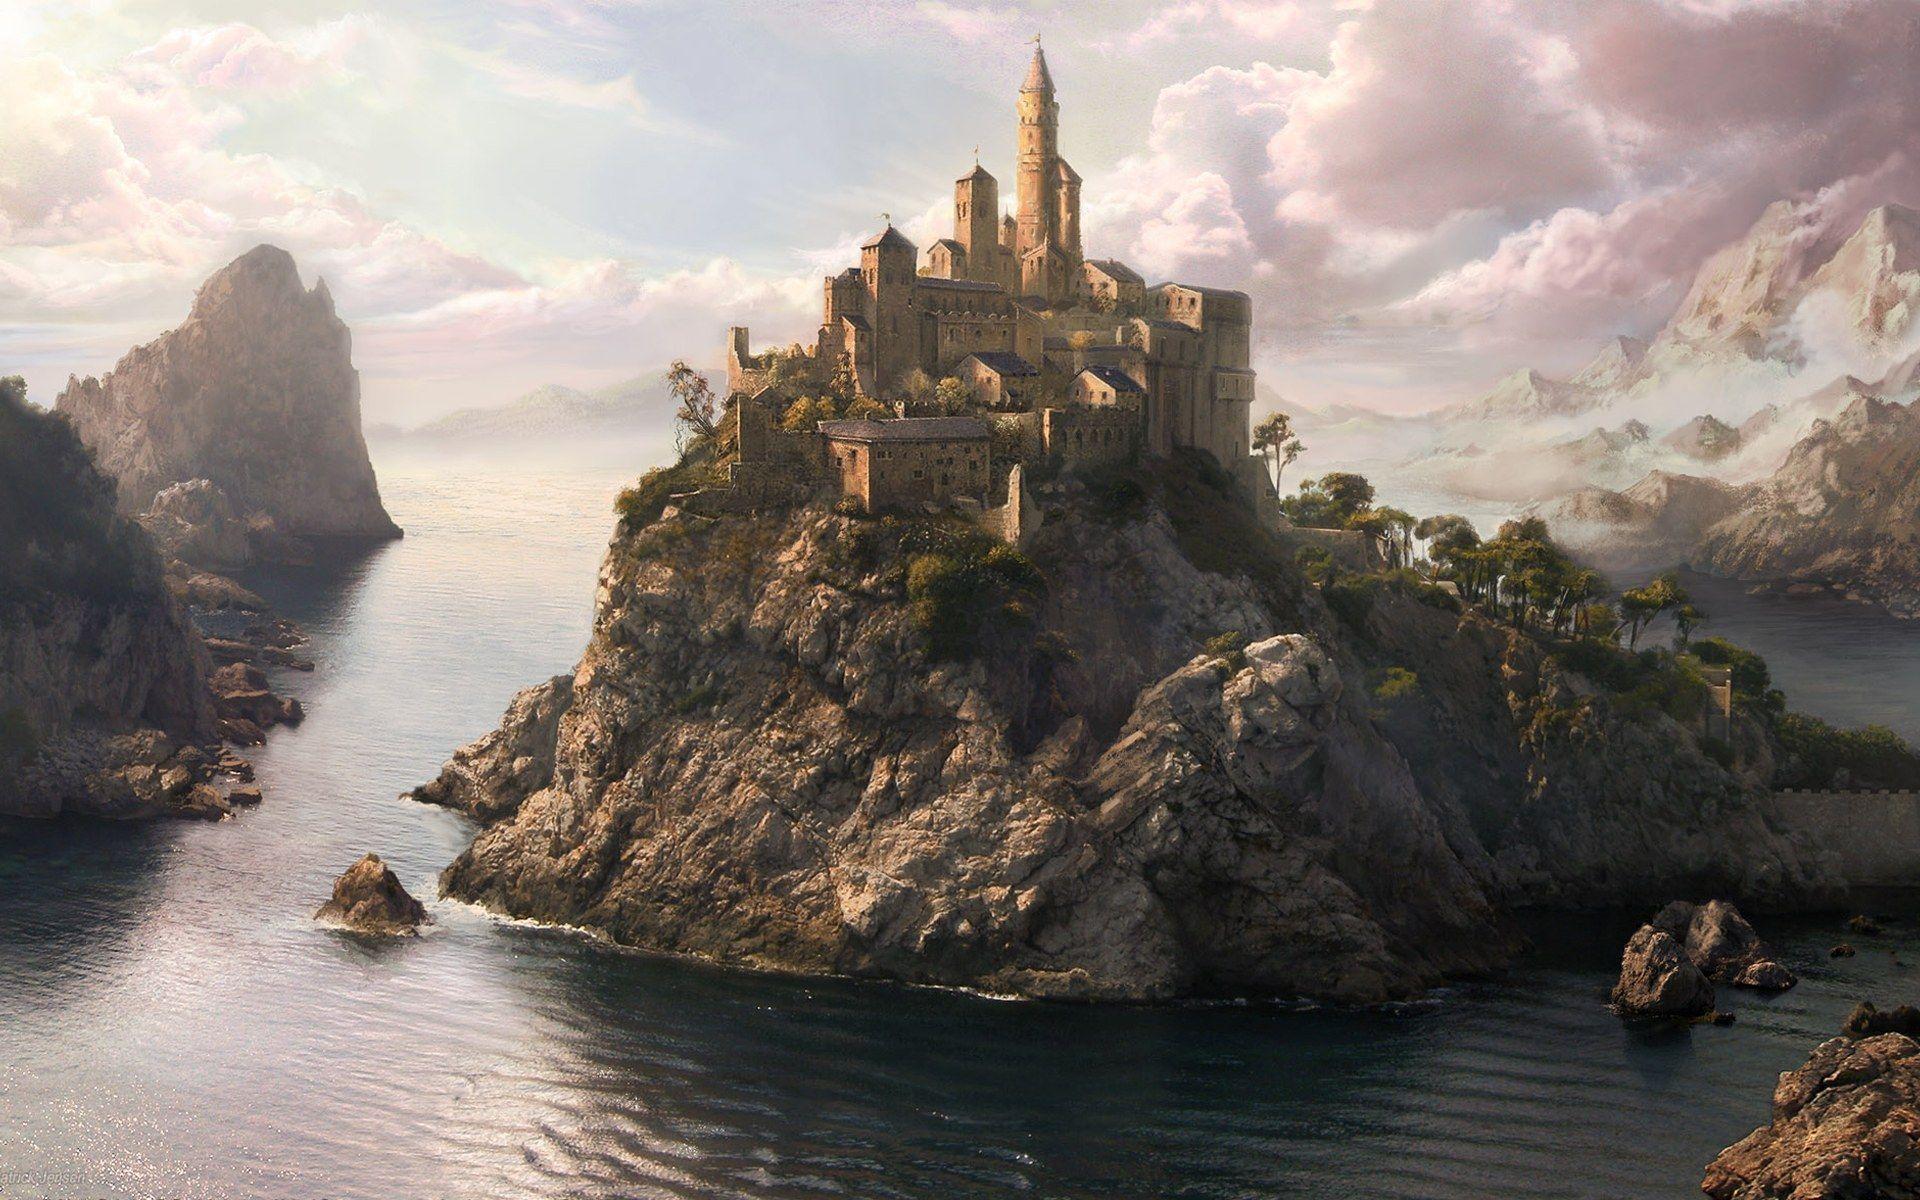 The Island City of Chyh-Mehm